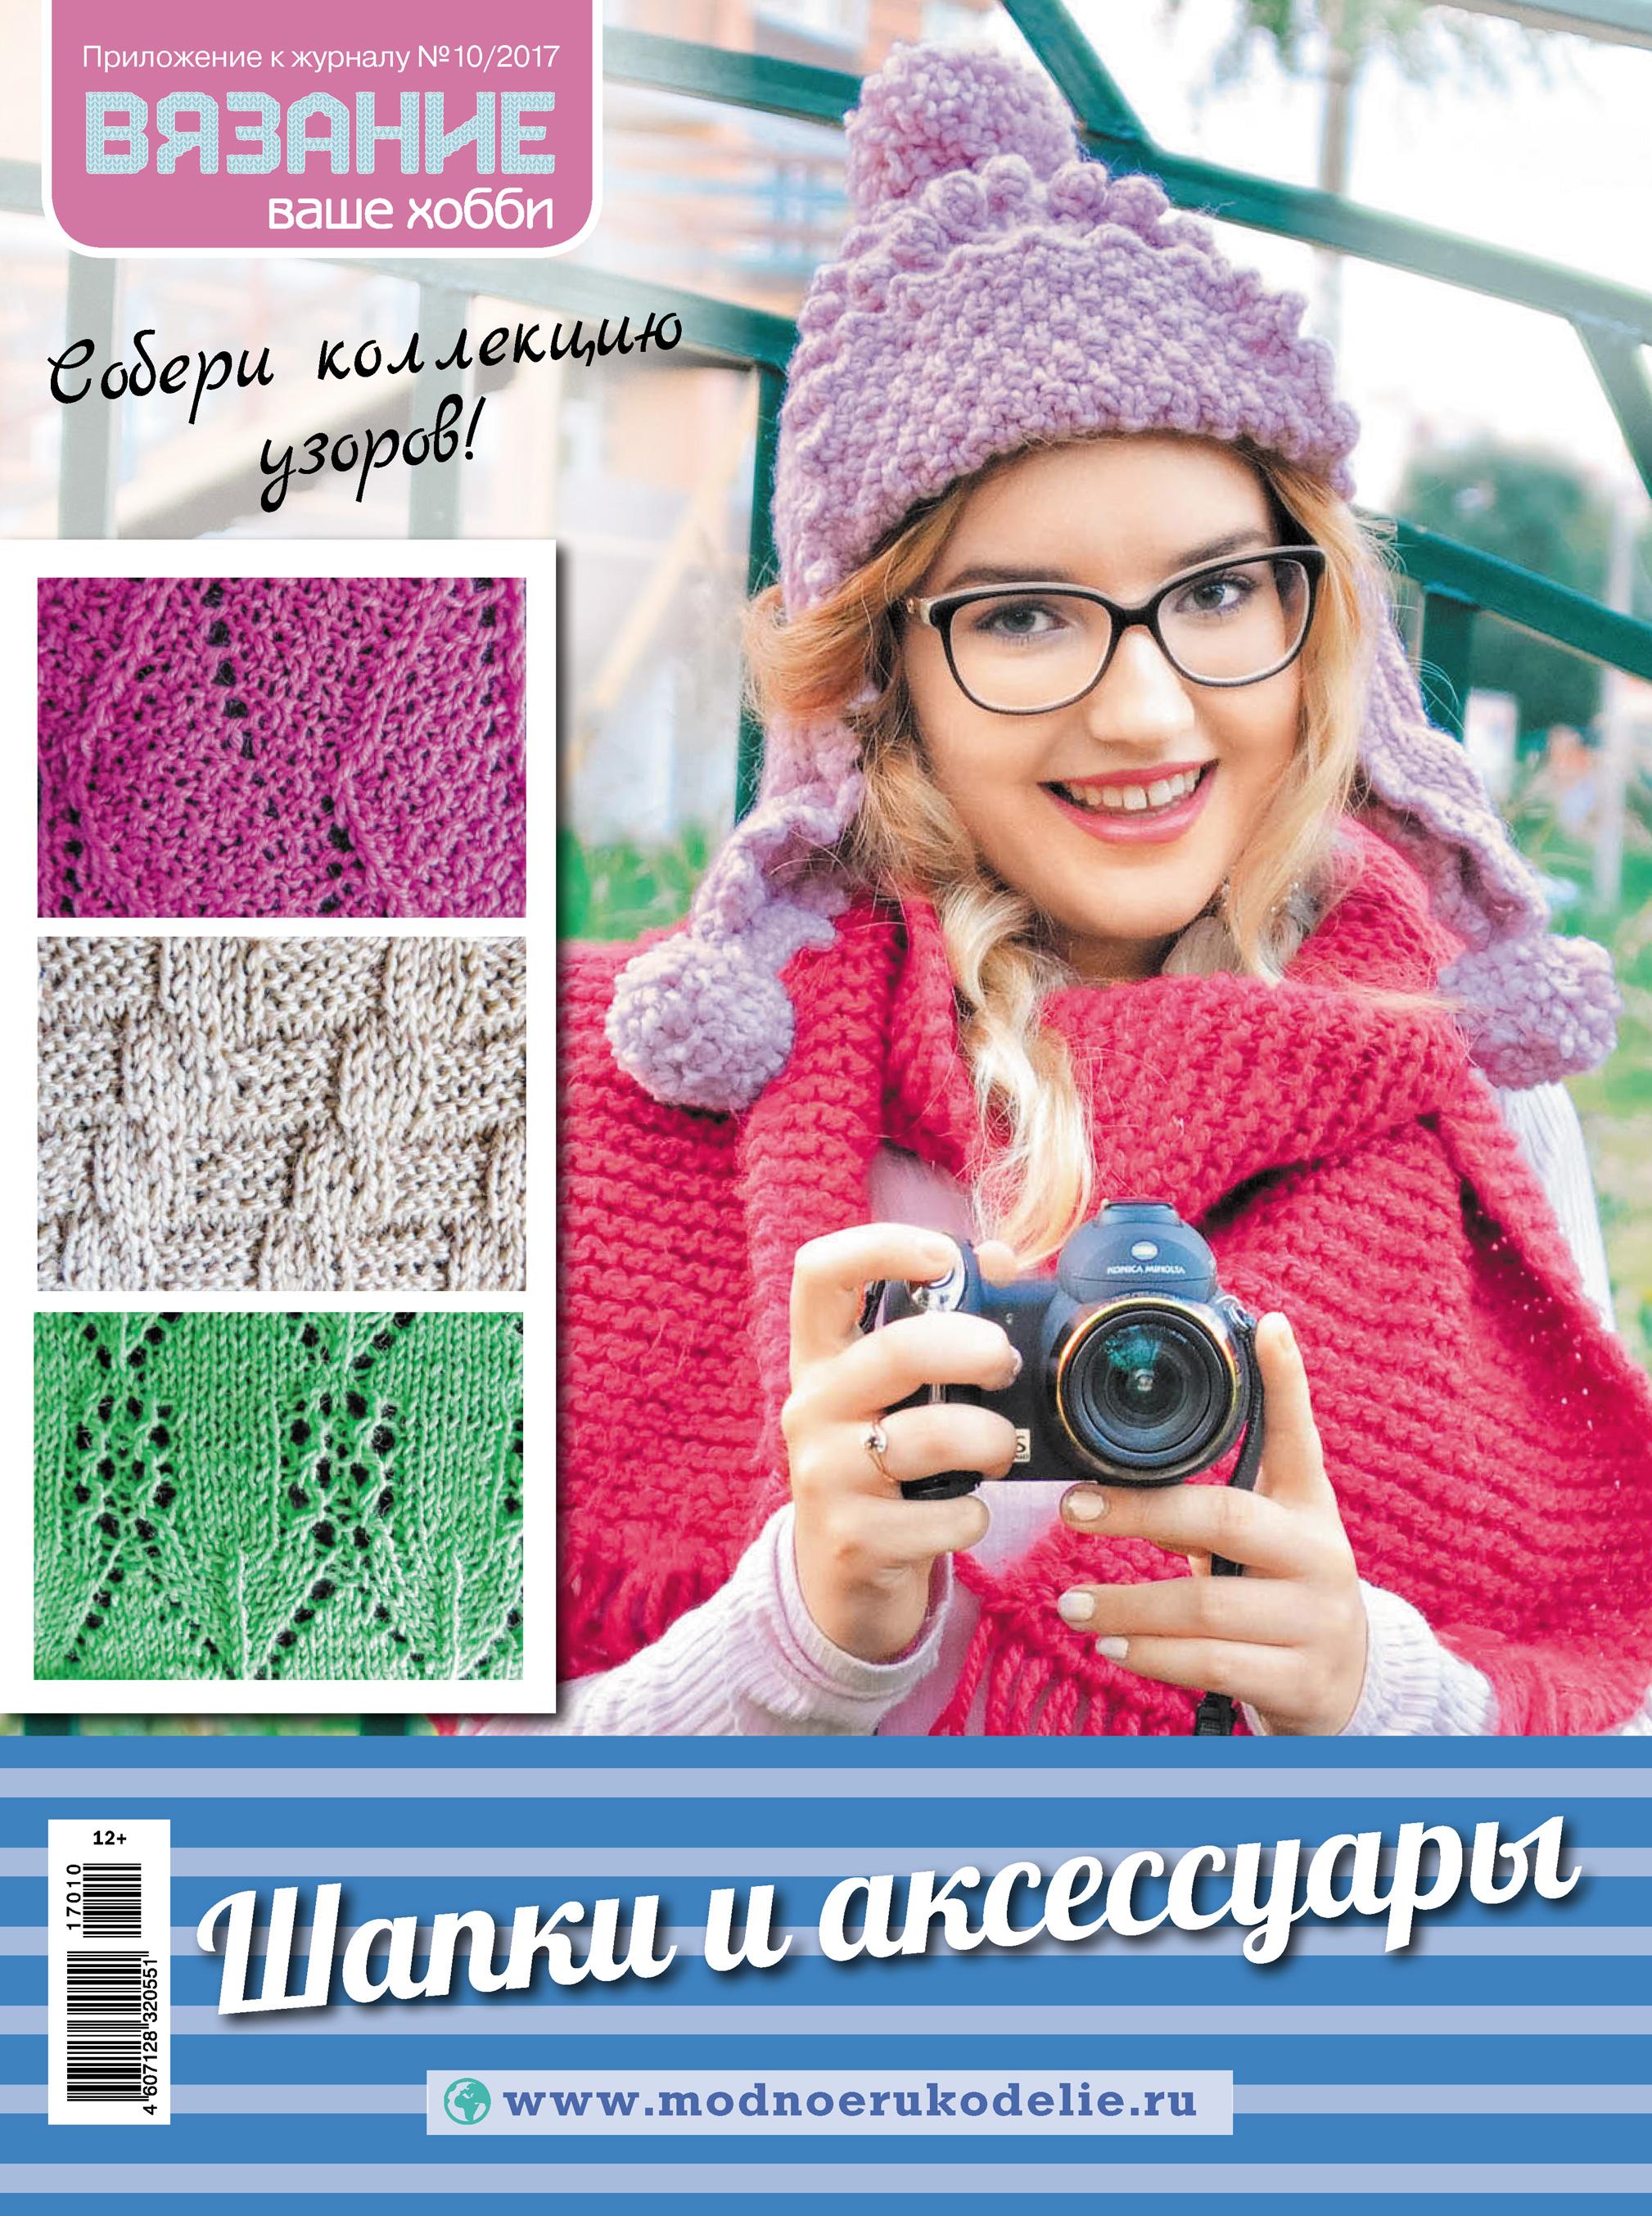 Вязание – ваше хобби. Приложение №10/2017. Шапки и аксессуары